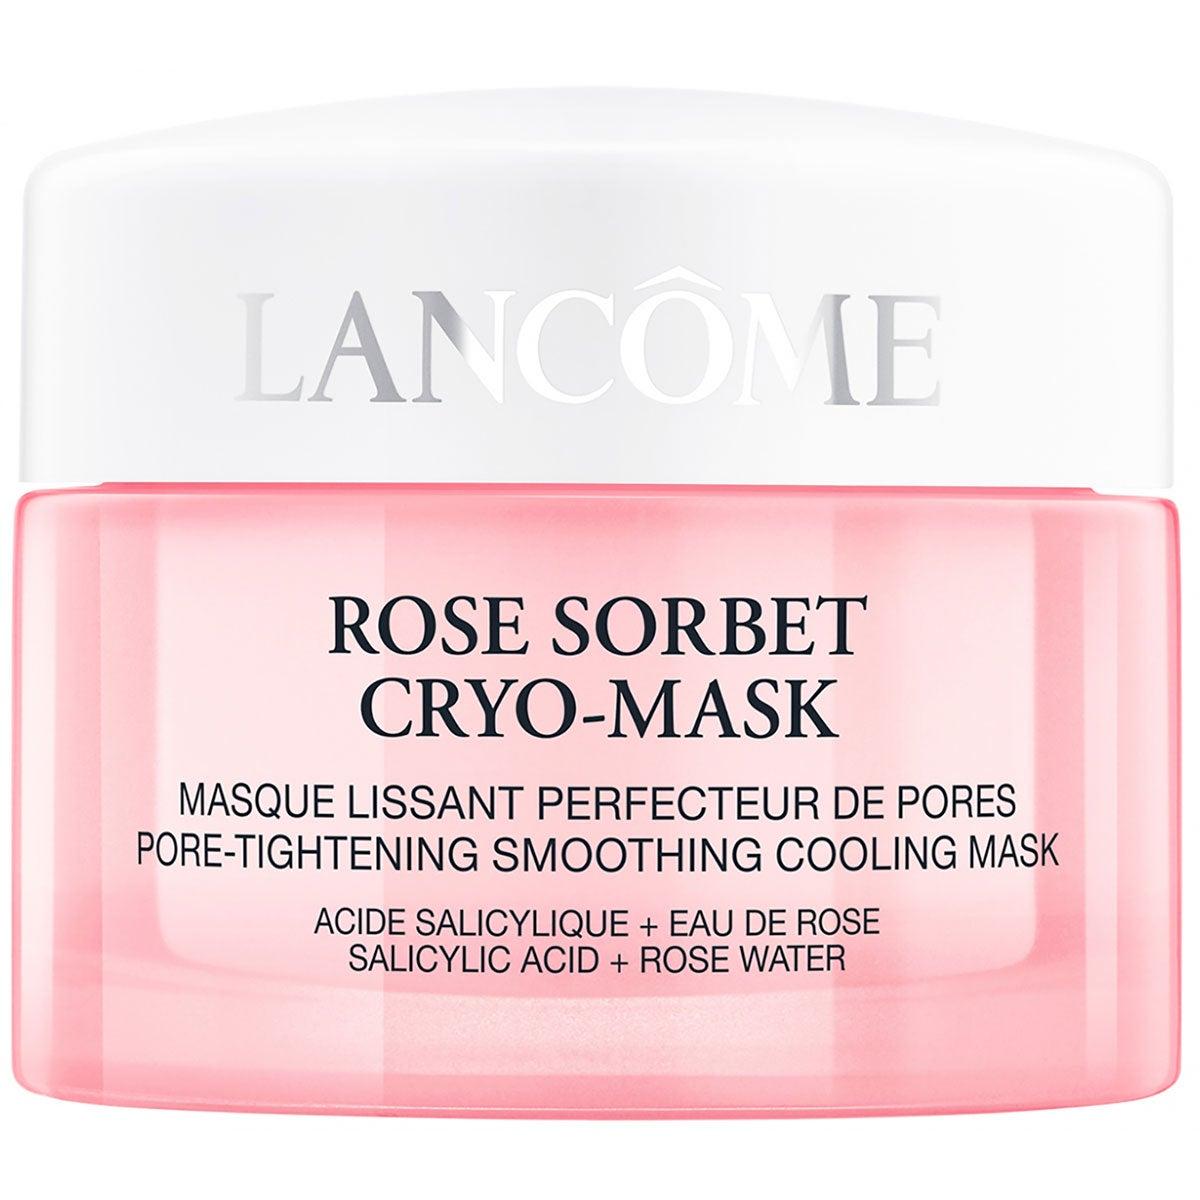 Lancôme Rose Sorbet Cryo-Mask 50 ml Lancôme Ansiktsmask